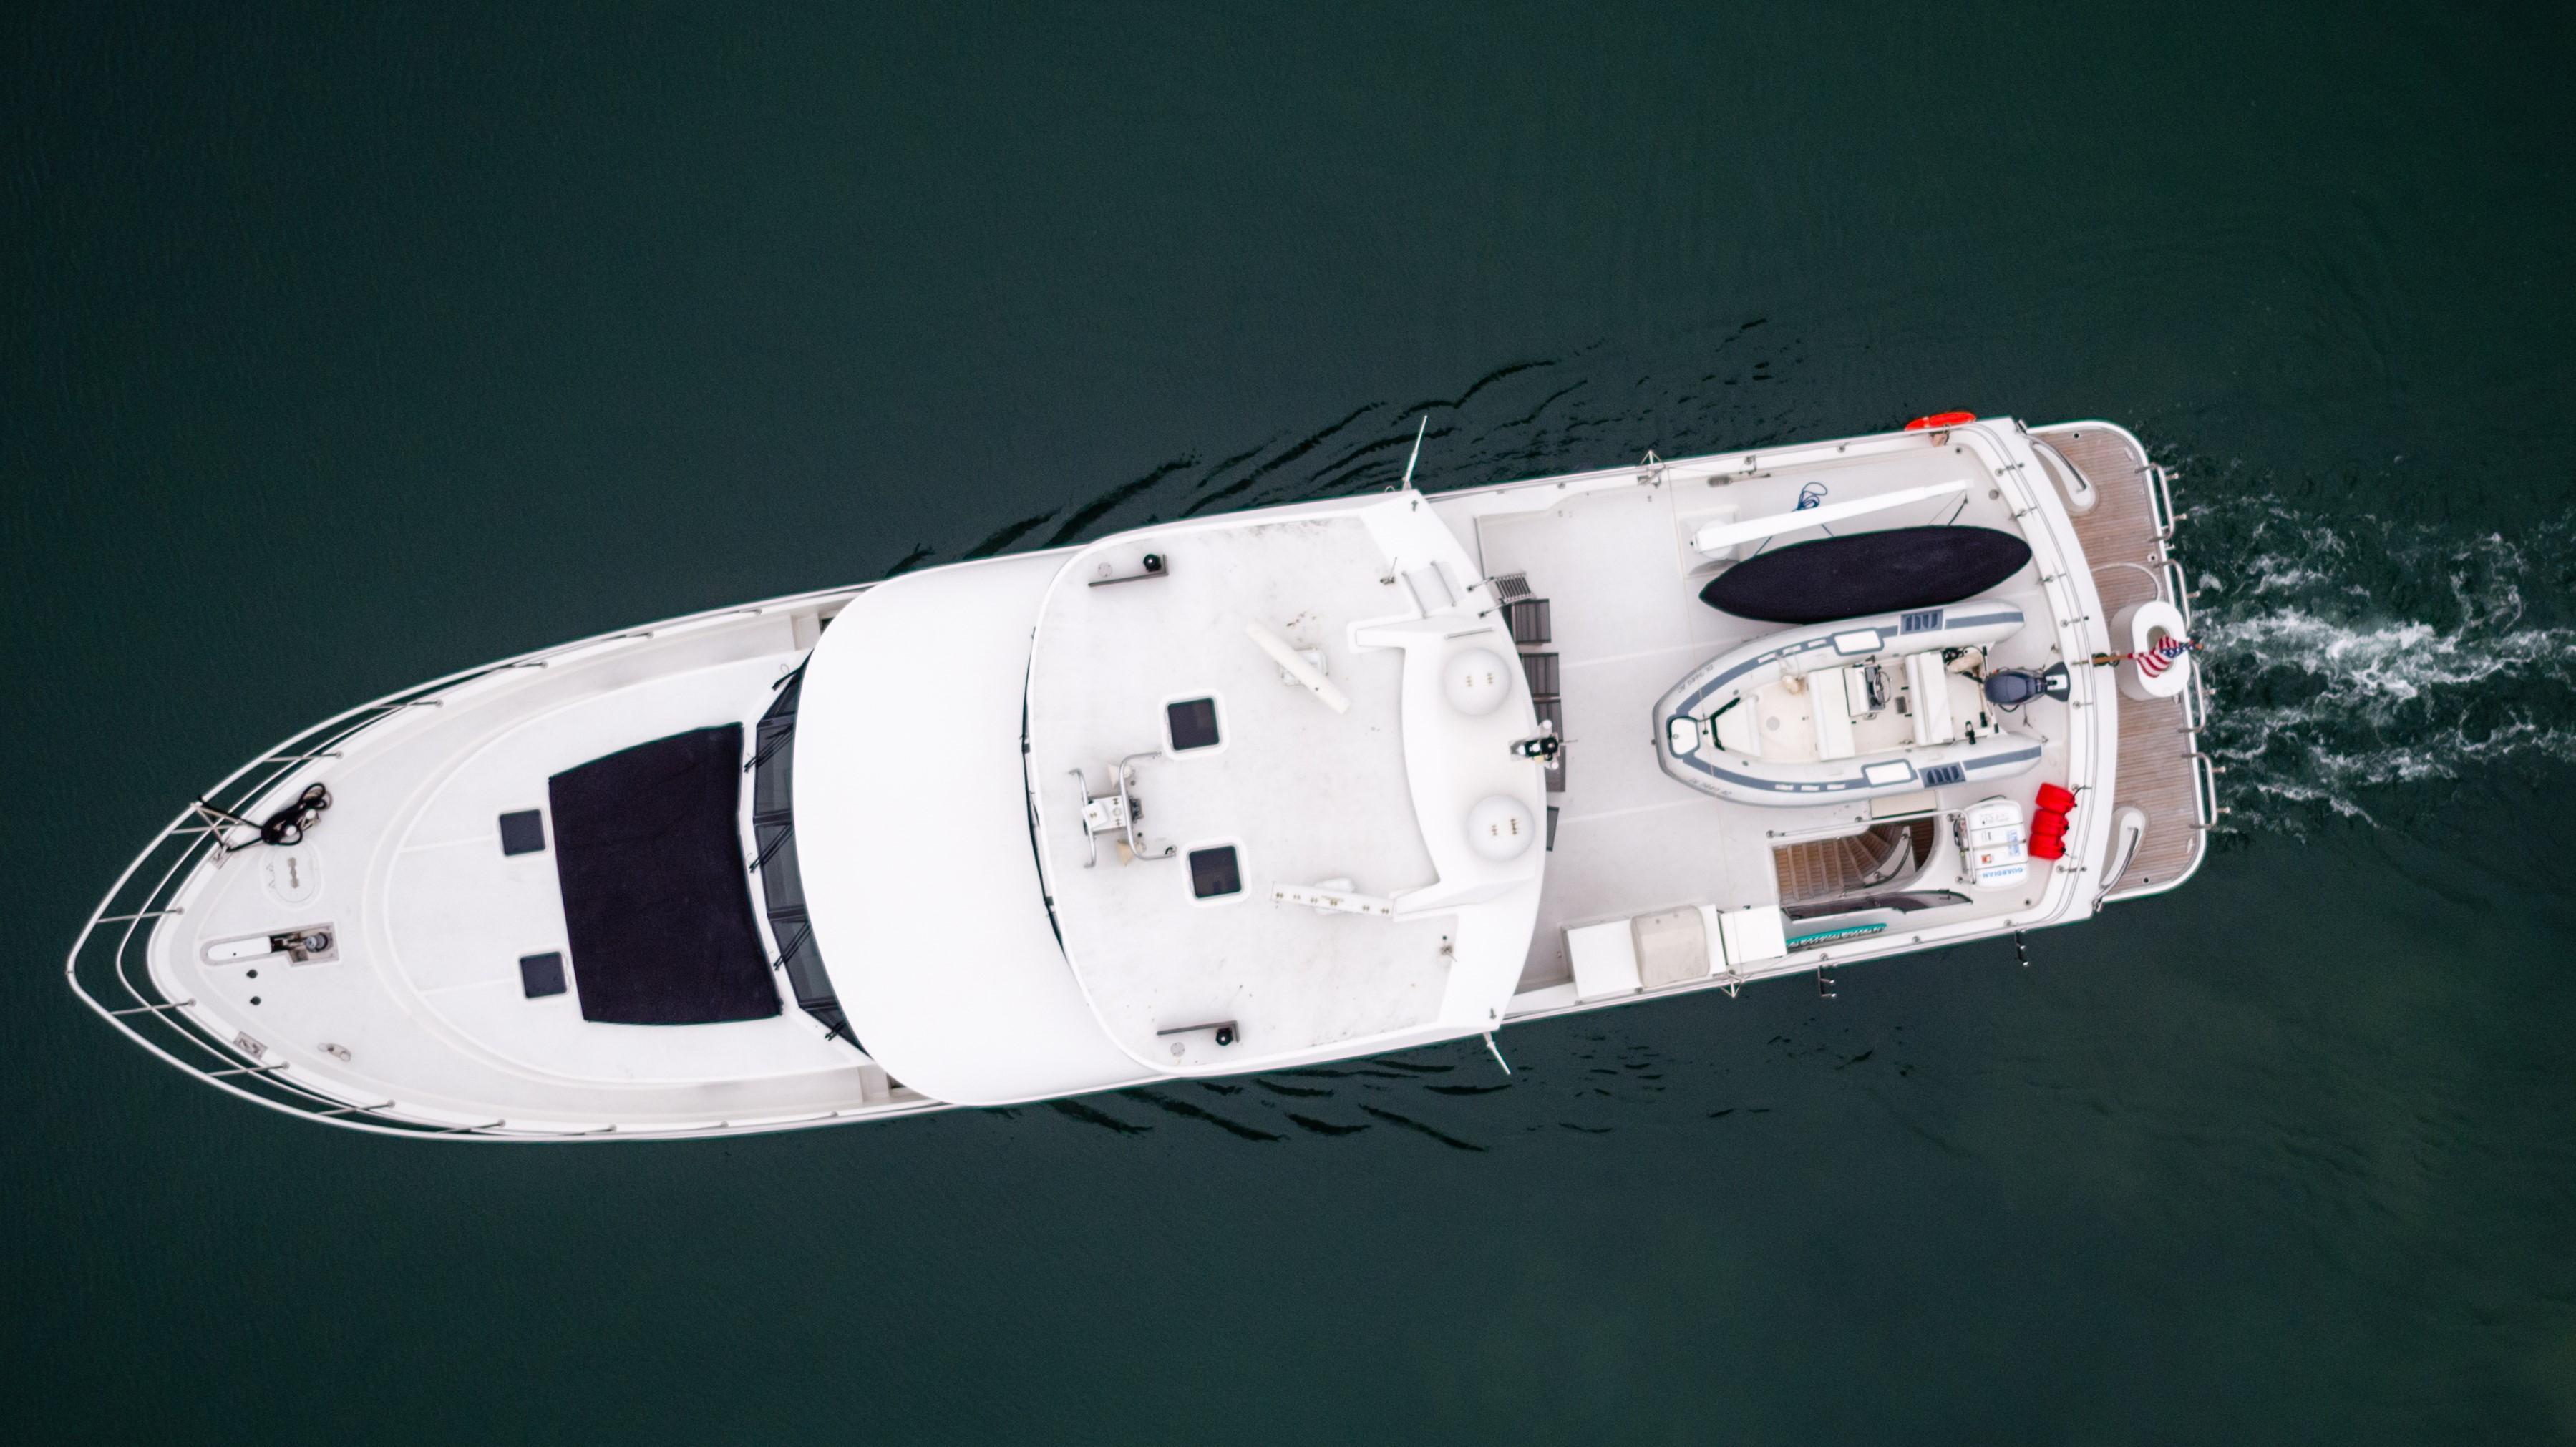 74 Ocean Alexander Coconut 2009 Channel Islands Harbor | Denison Yacht Sales